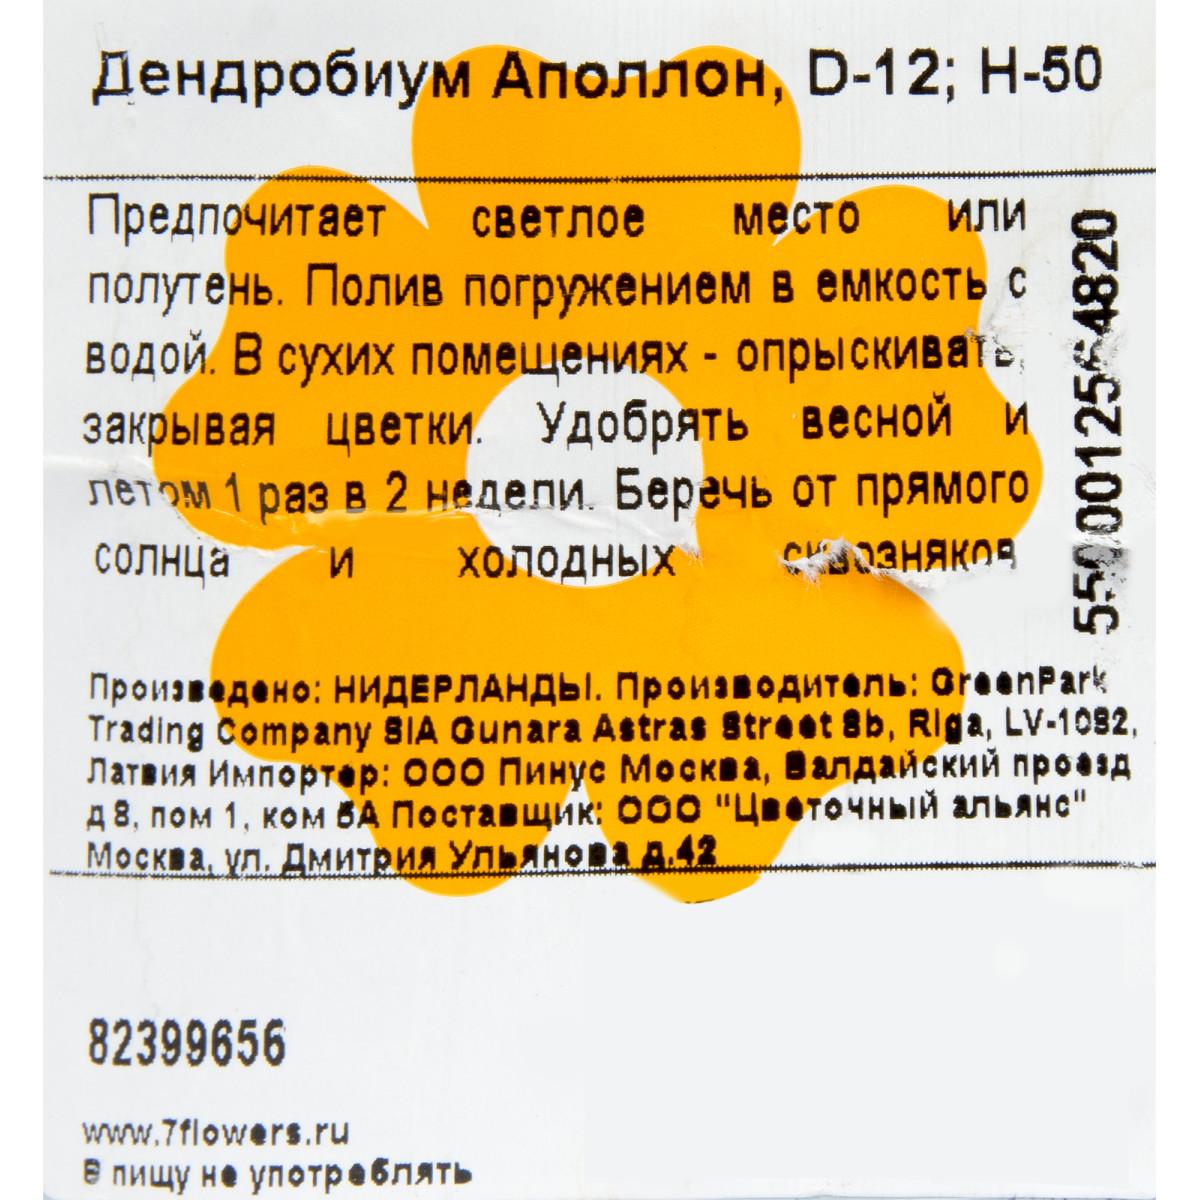 Дендробиум Аполлон 12x50